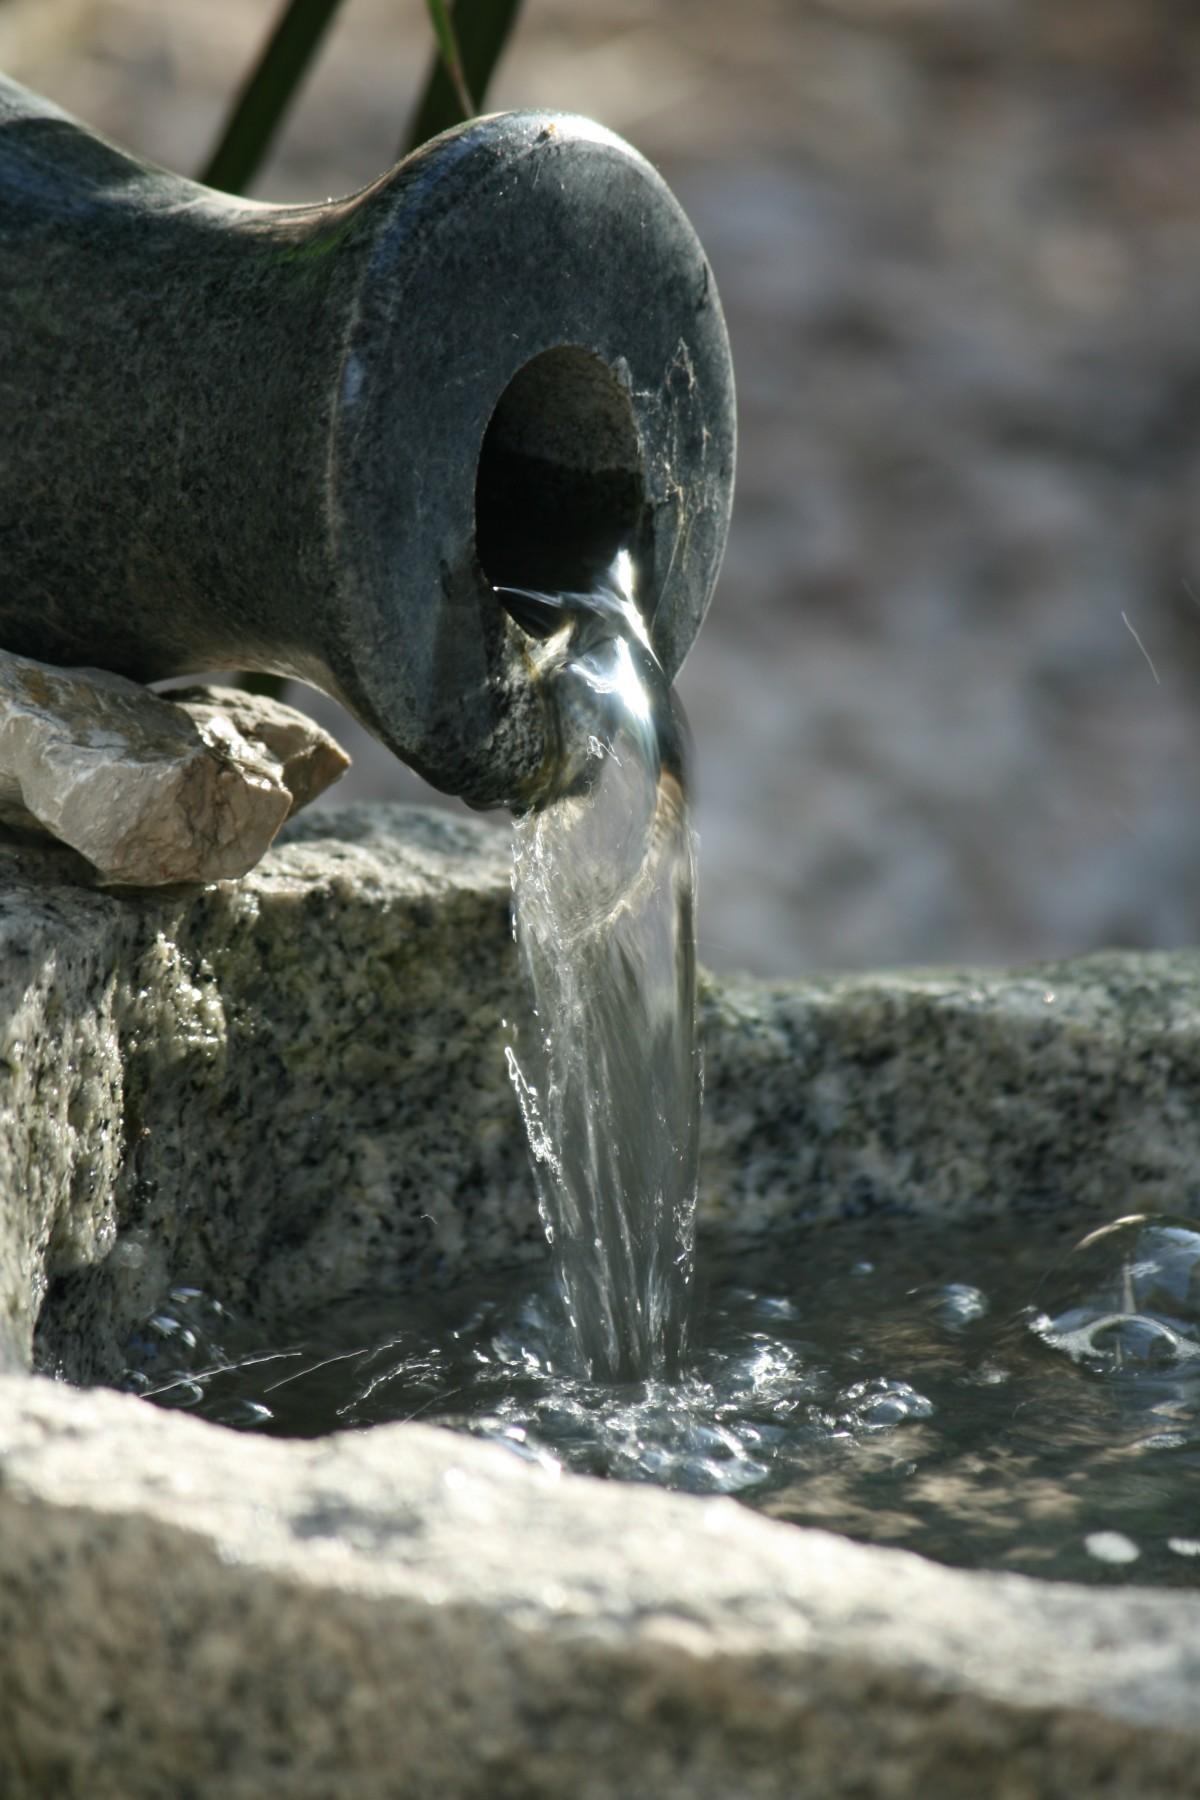 water rock summer wildlife statue material sculpture water feature amphora